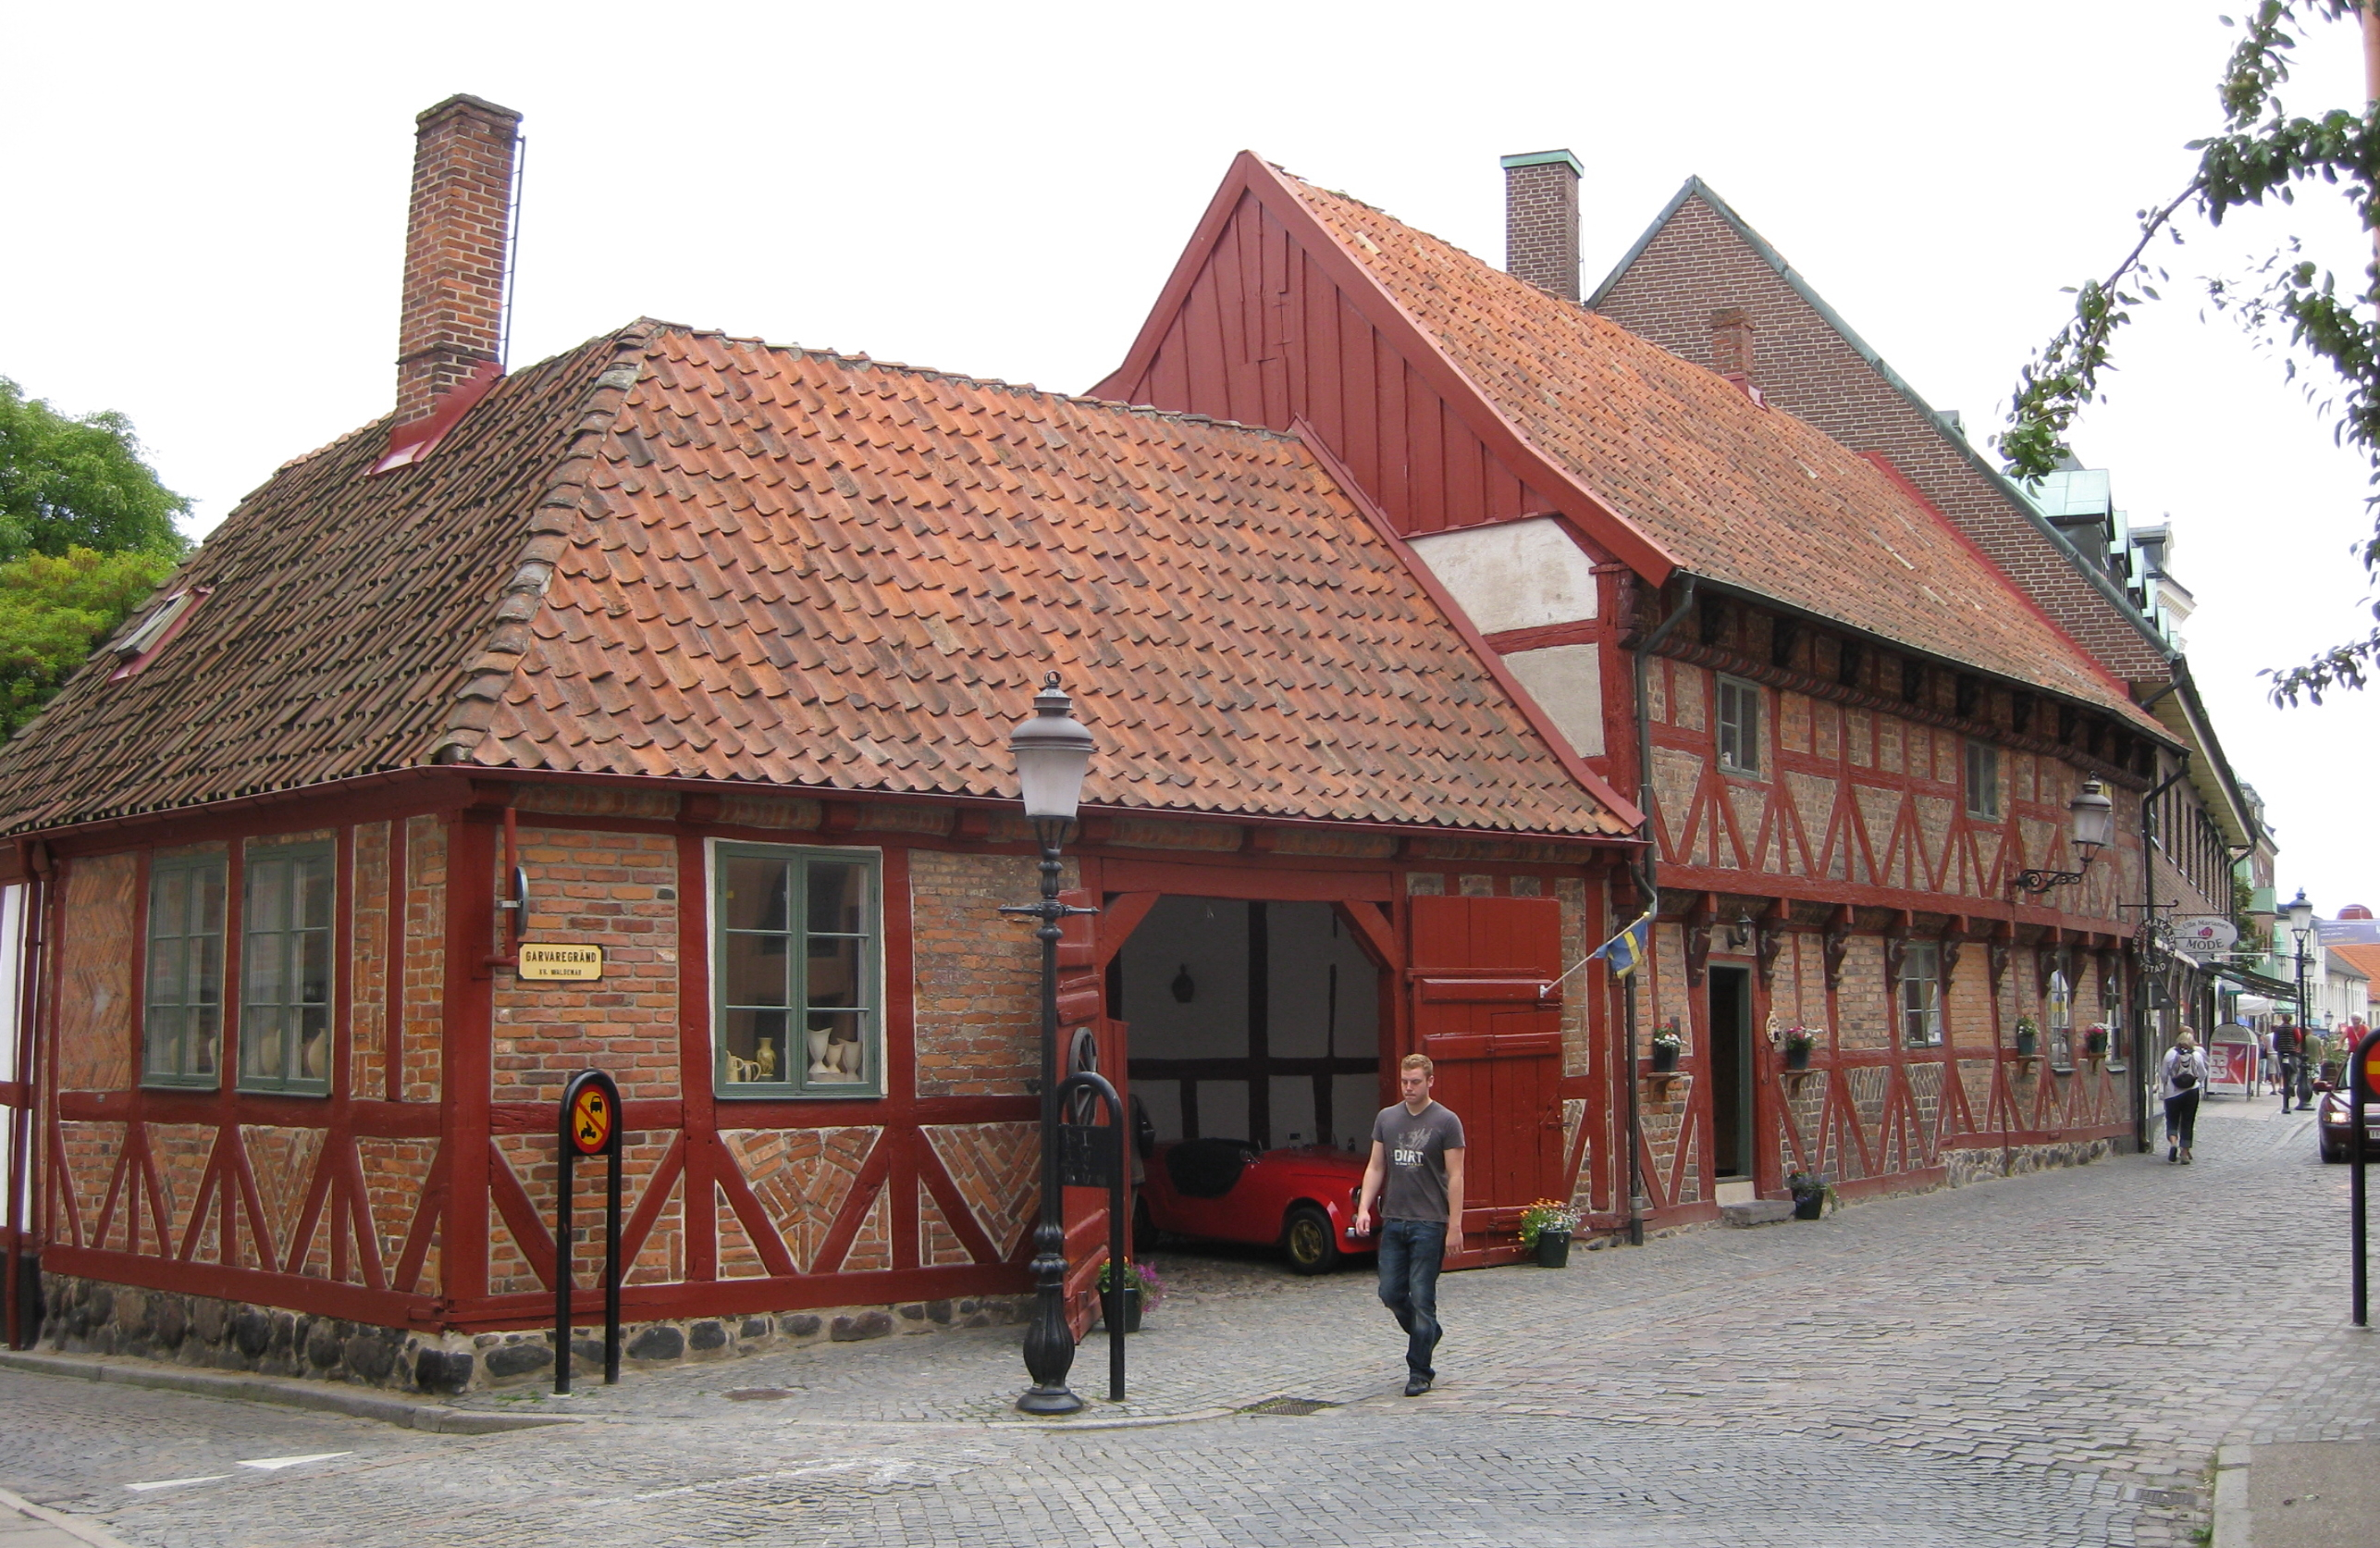 Case in korsvirke ad Ystad